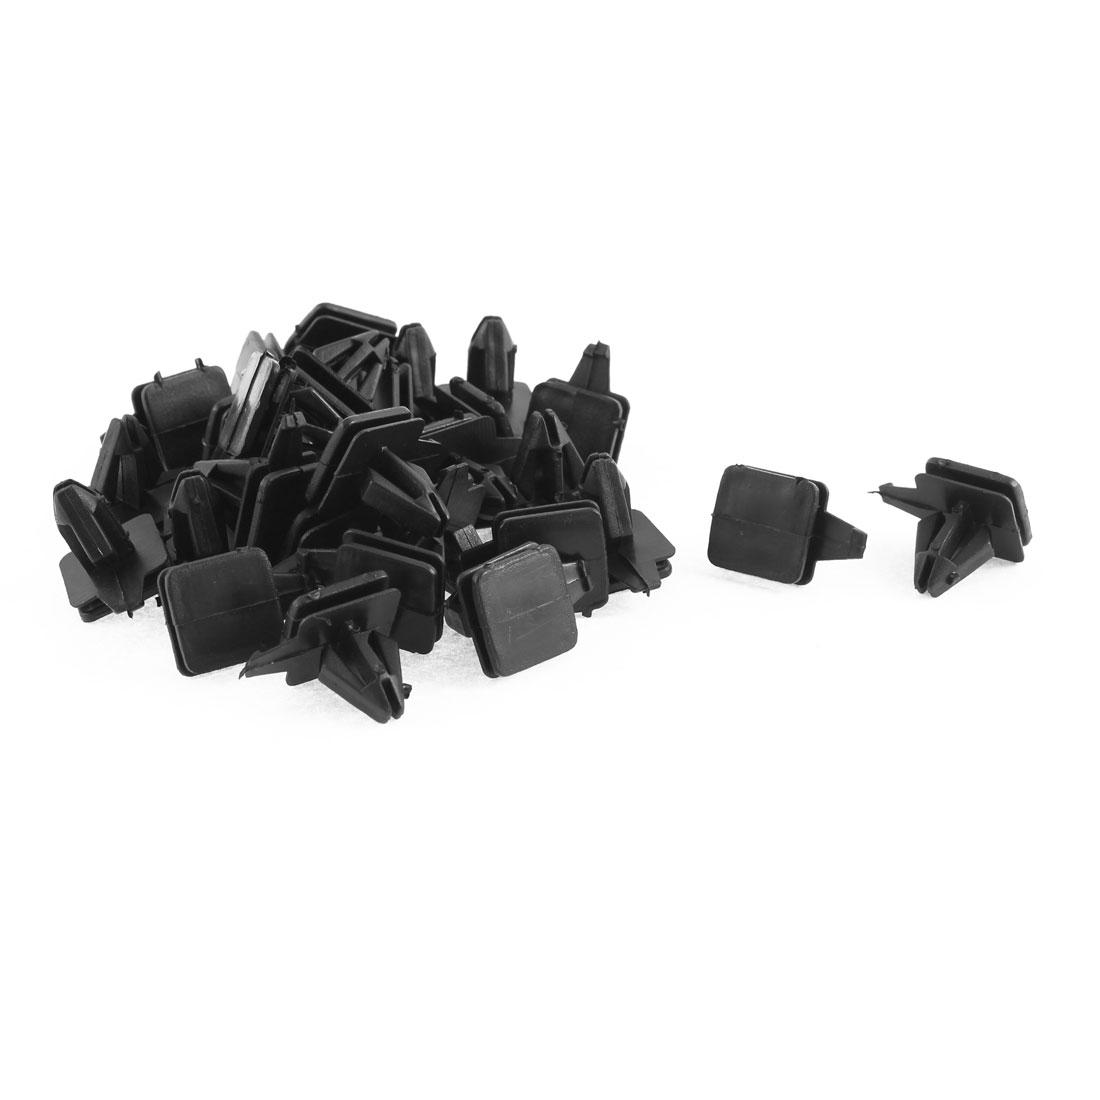 30 Pcs Black Plastic Door Trim Buckle Moulding Rivet for Buick